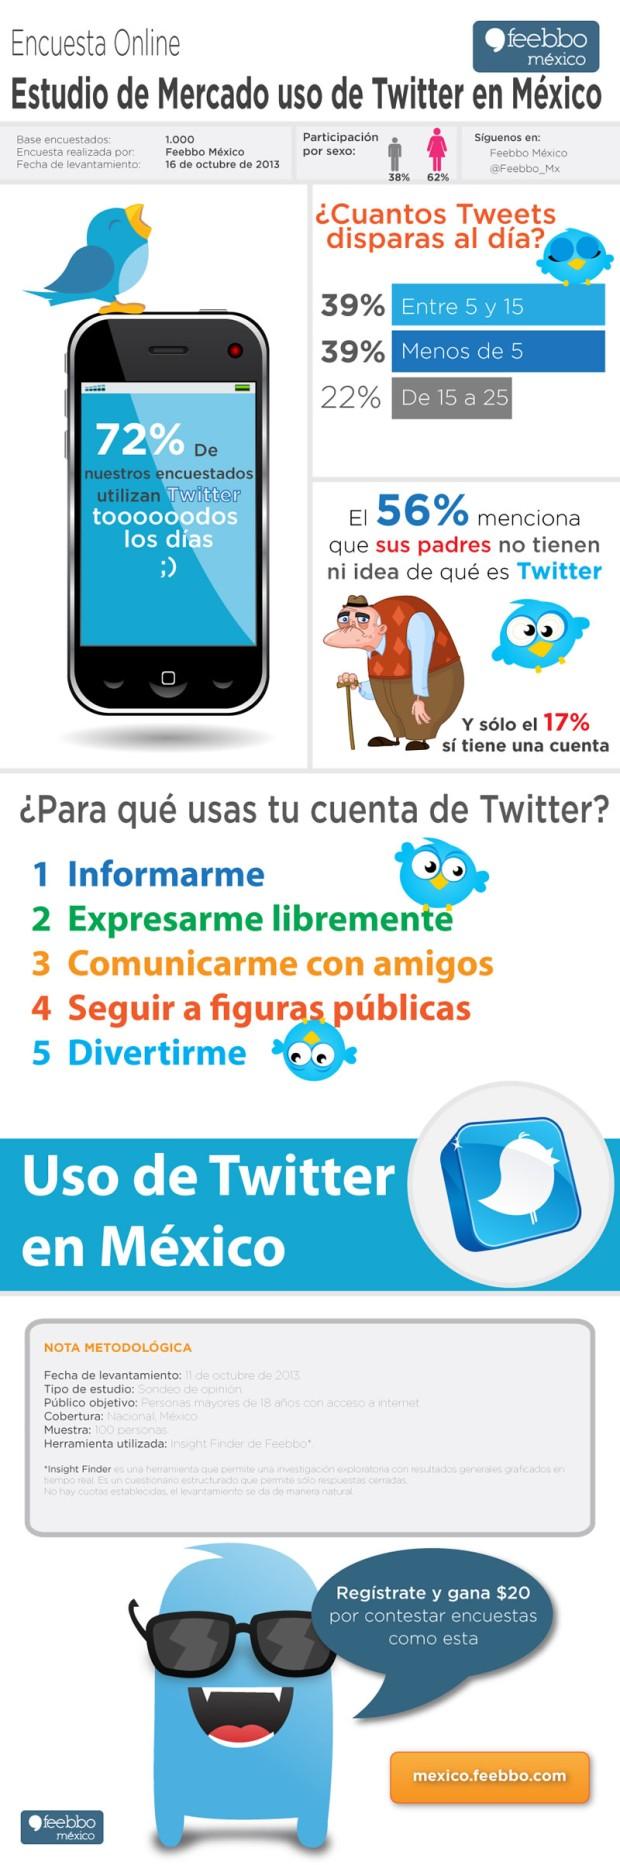 Uso de Twitter en México